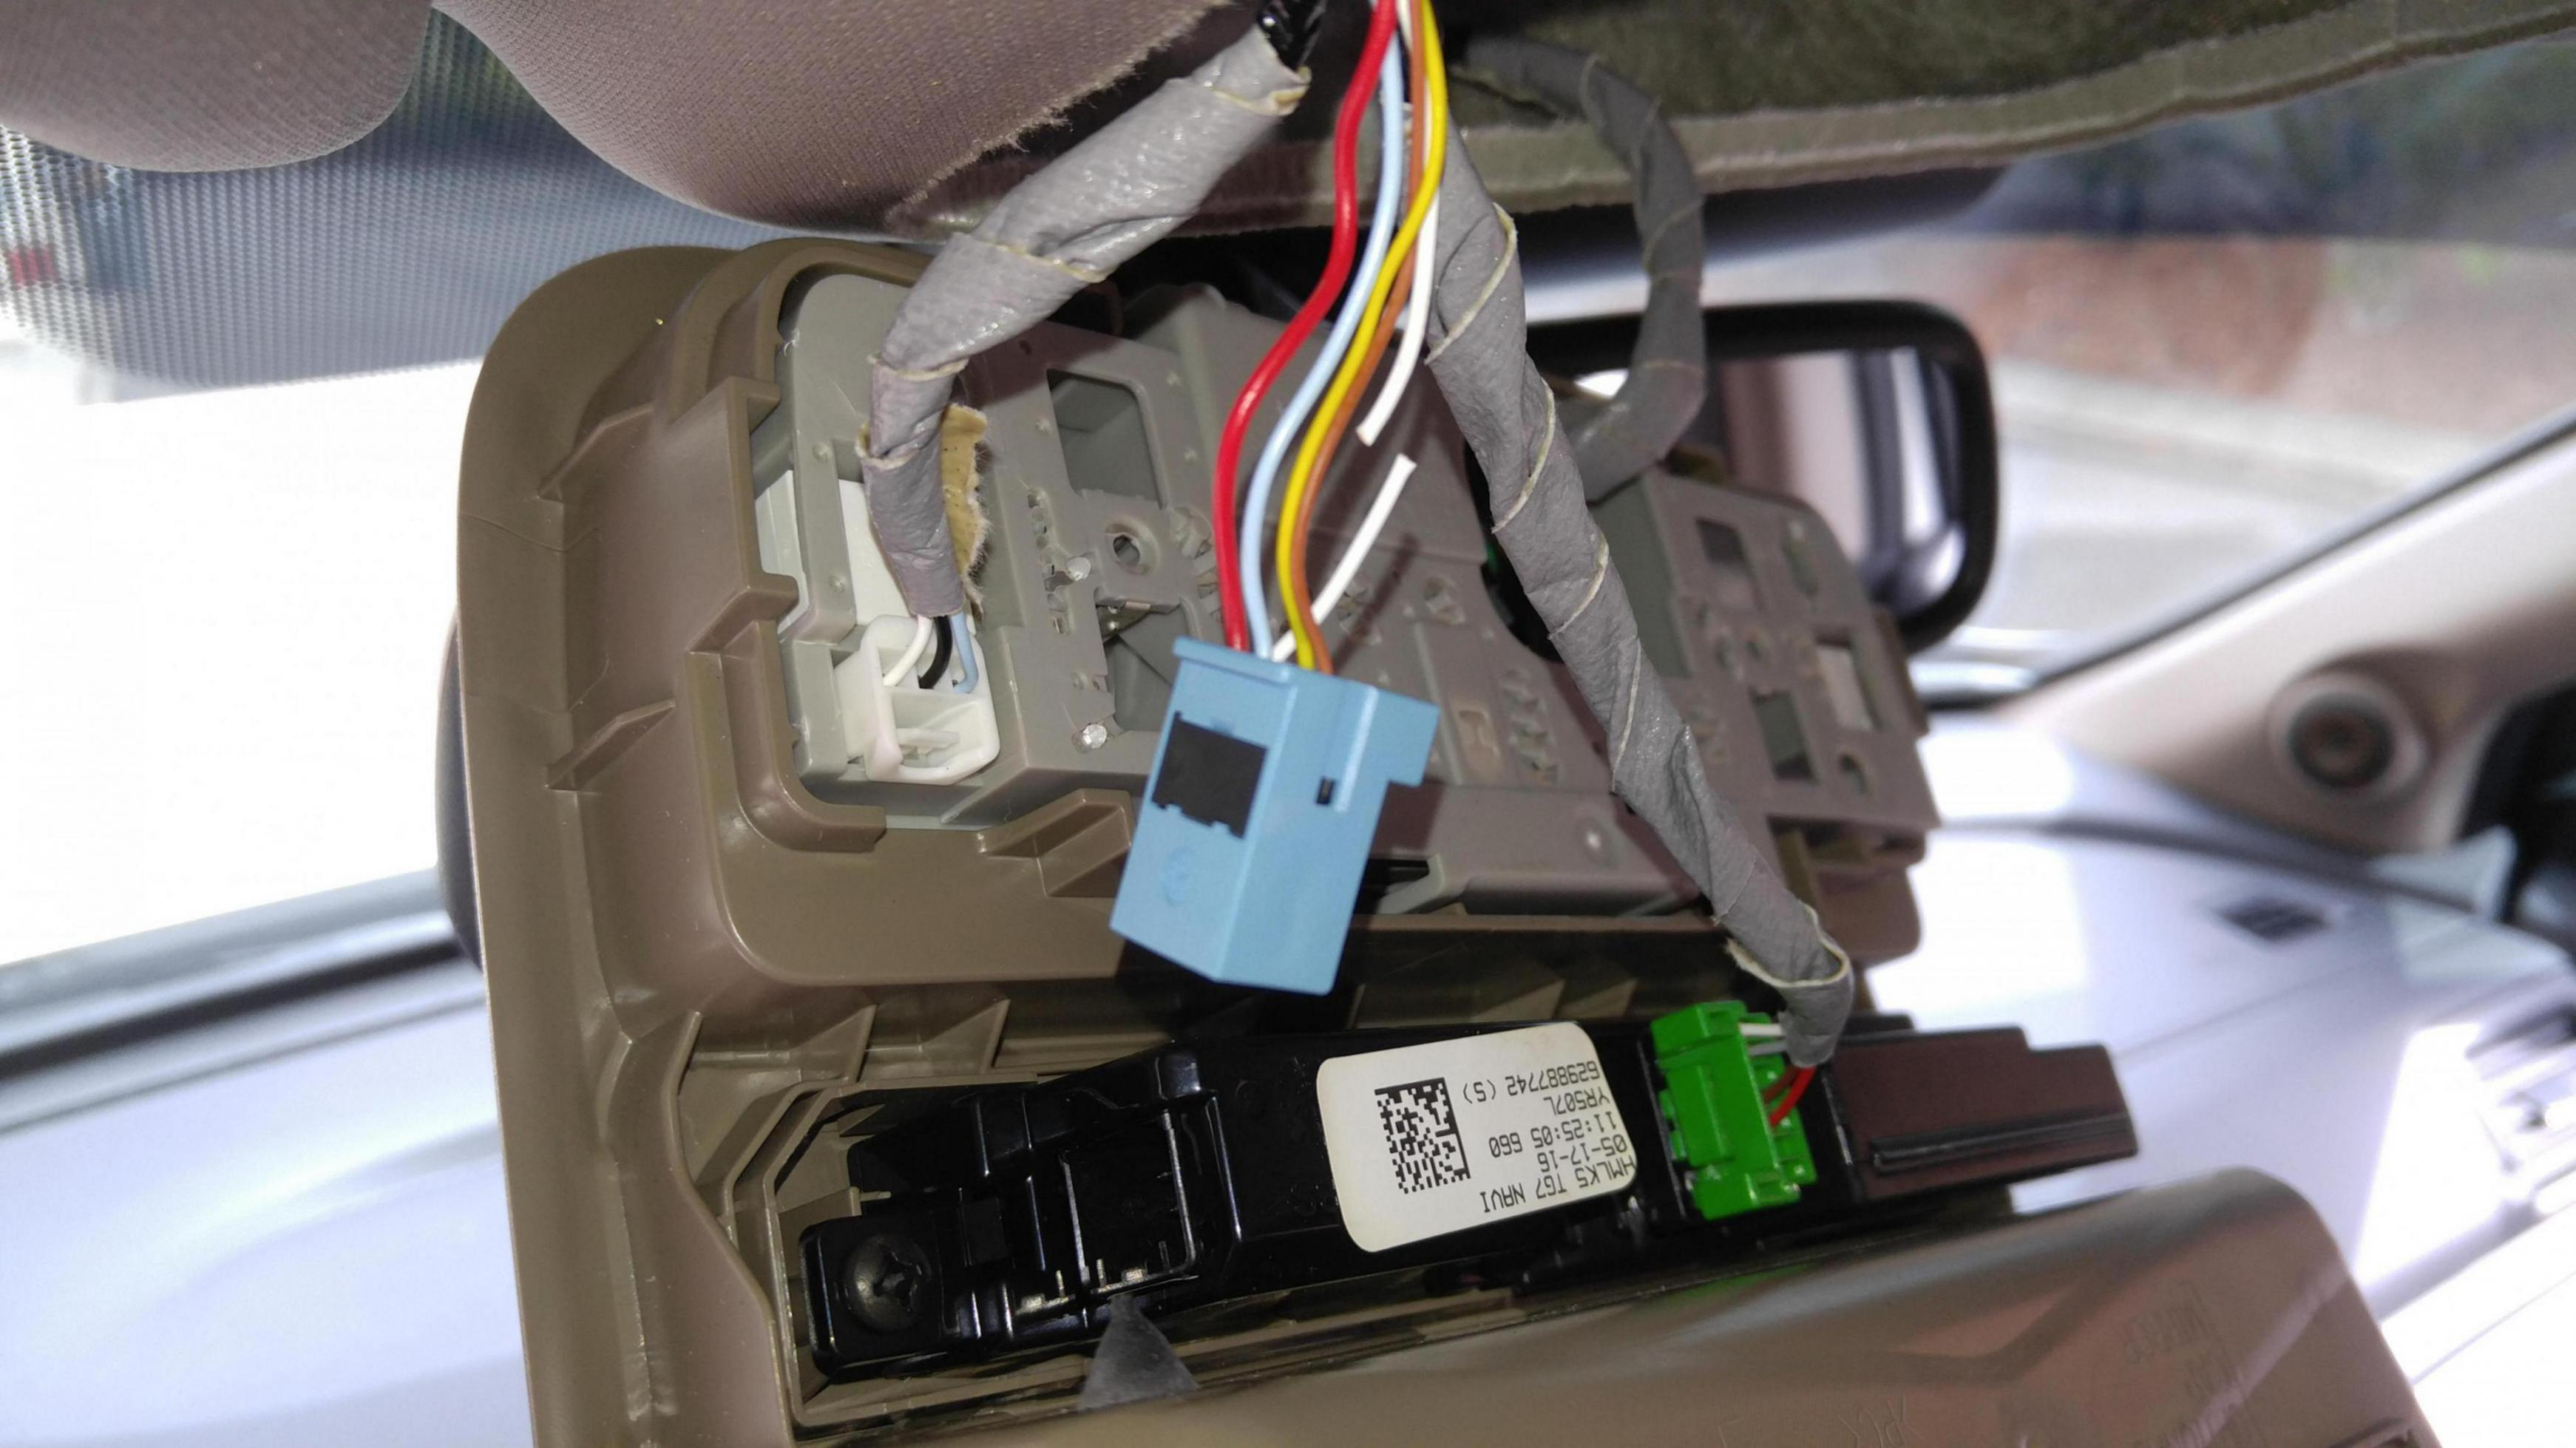 Anc Honda Pilot S. Click For Larger Version Name 08101610441470956442837 Views 814 Size 4345. Honda. Honda Pilot Home Link Wiring Diagram At Scoala.co